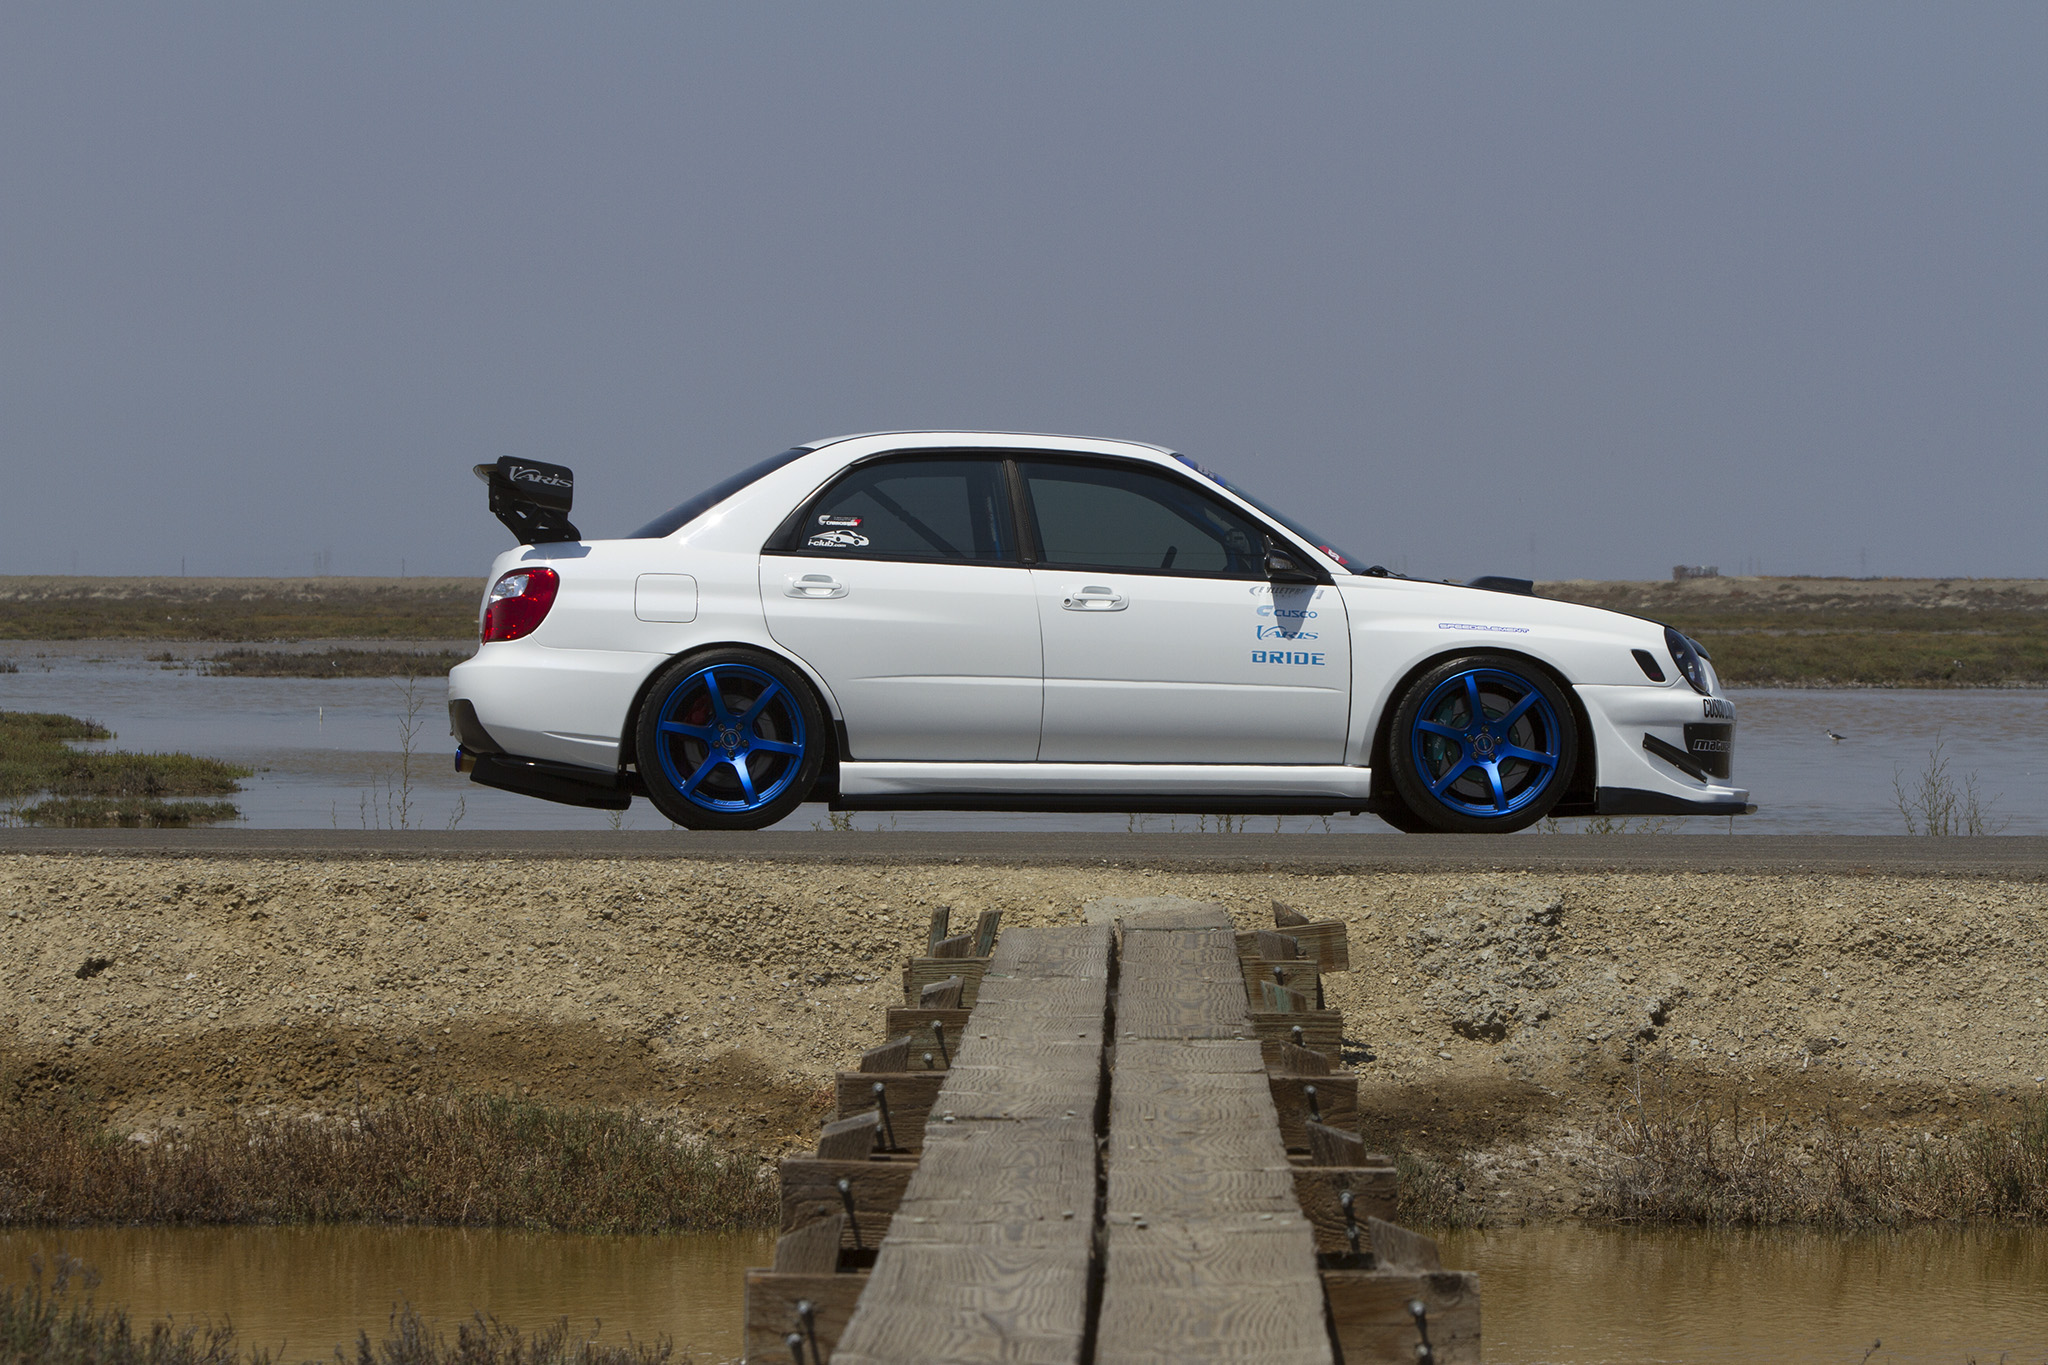 JDM EJ207 Swapped Subaru WRX - The Convert Photo & Image Gallery